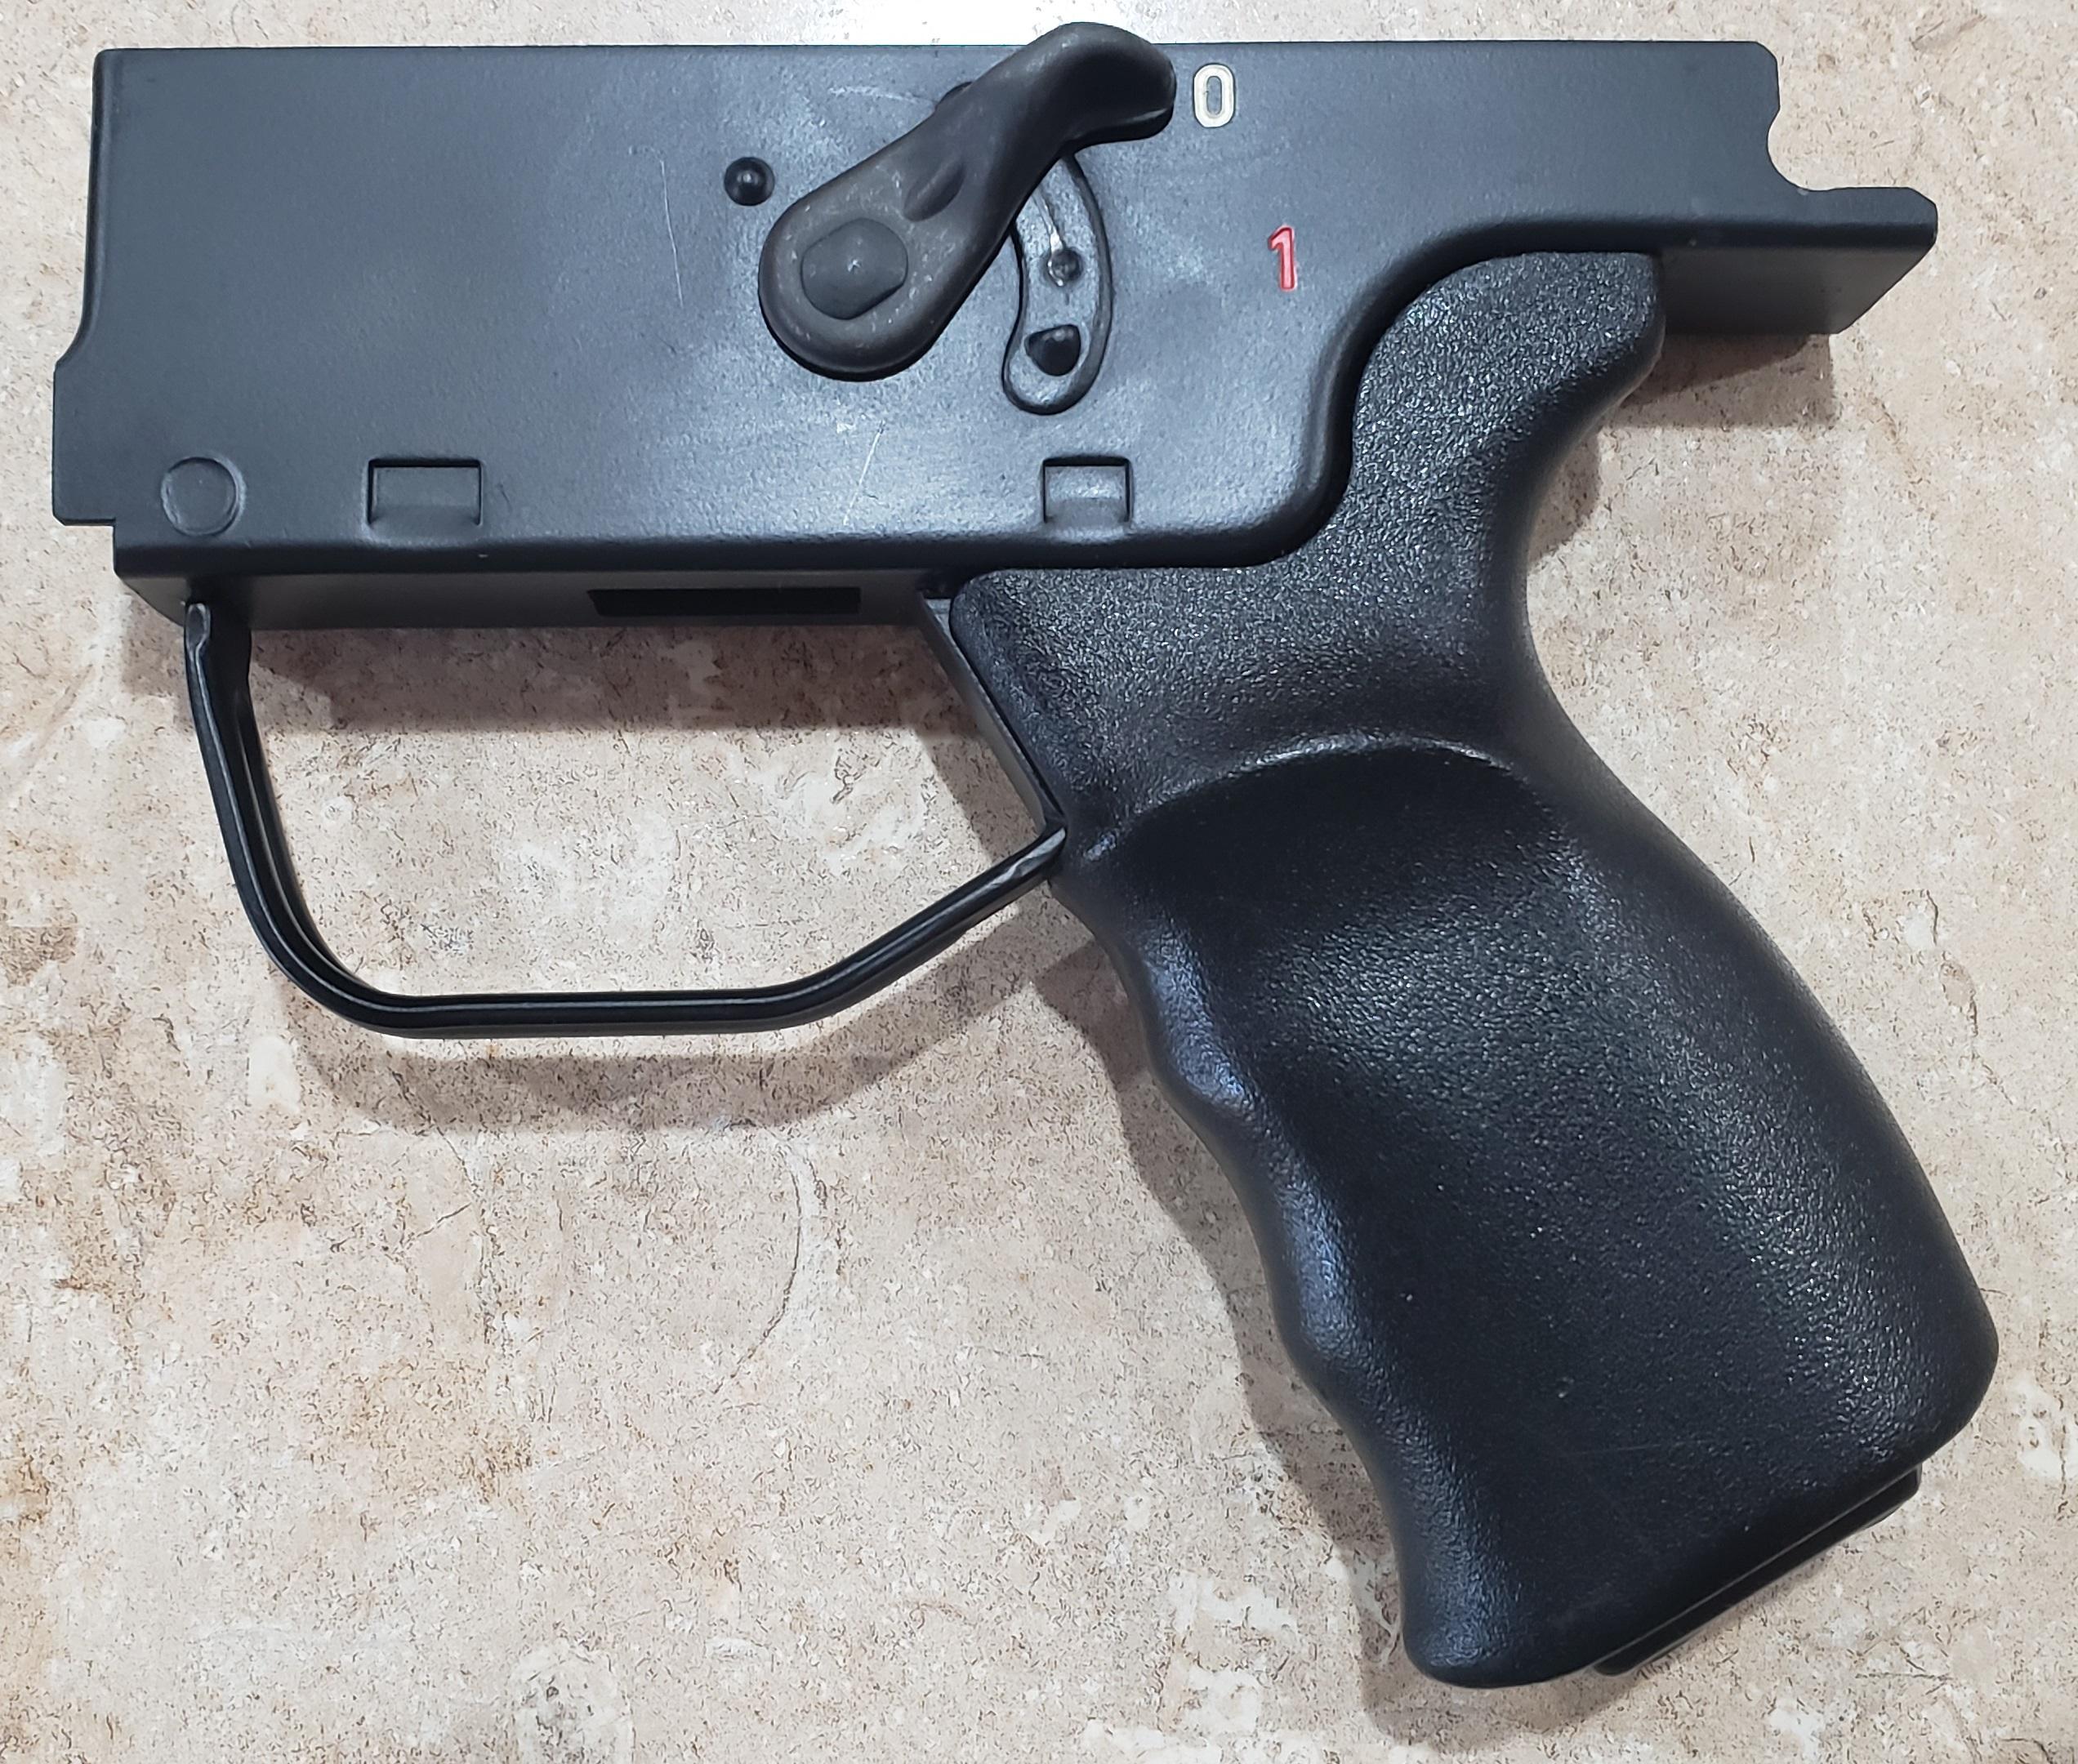 WTS: C93 Furniture, LDI MP5 Vis laser, A3 Pistol Brace, G36 Armorer's Kit *New Items*-94-1.jpg